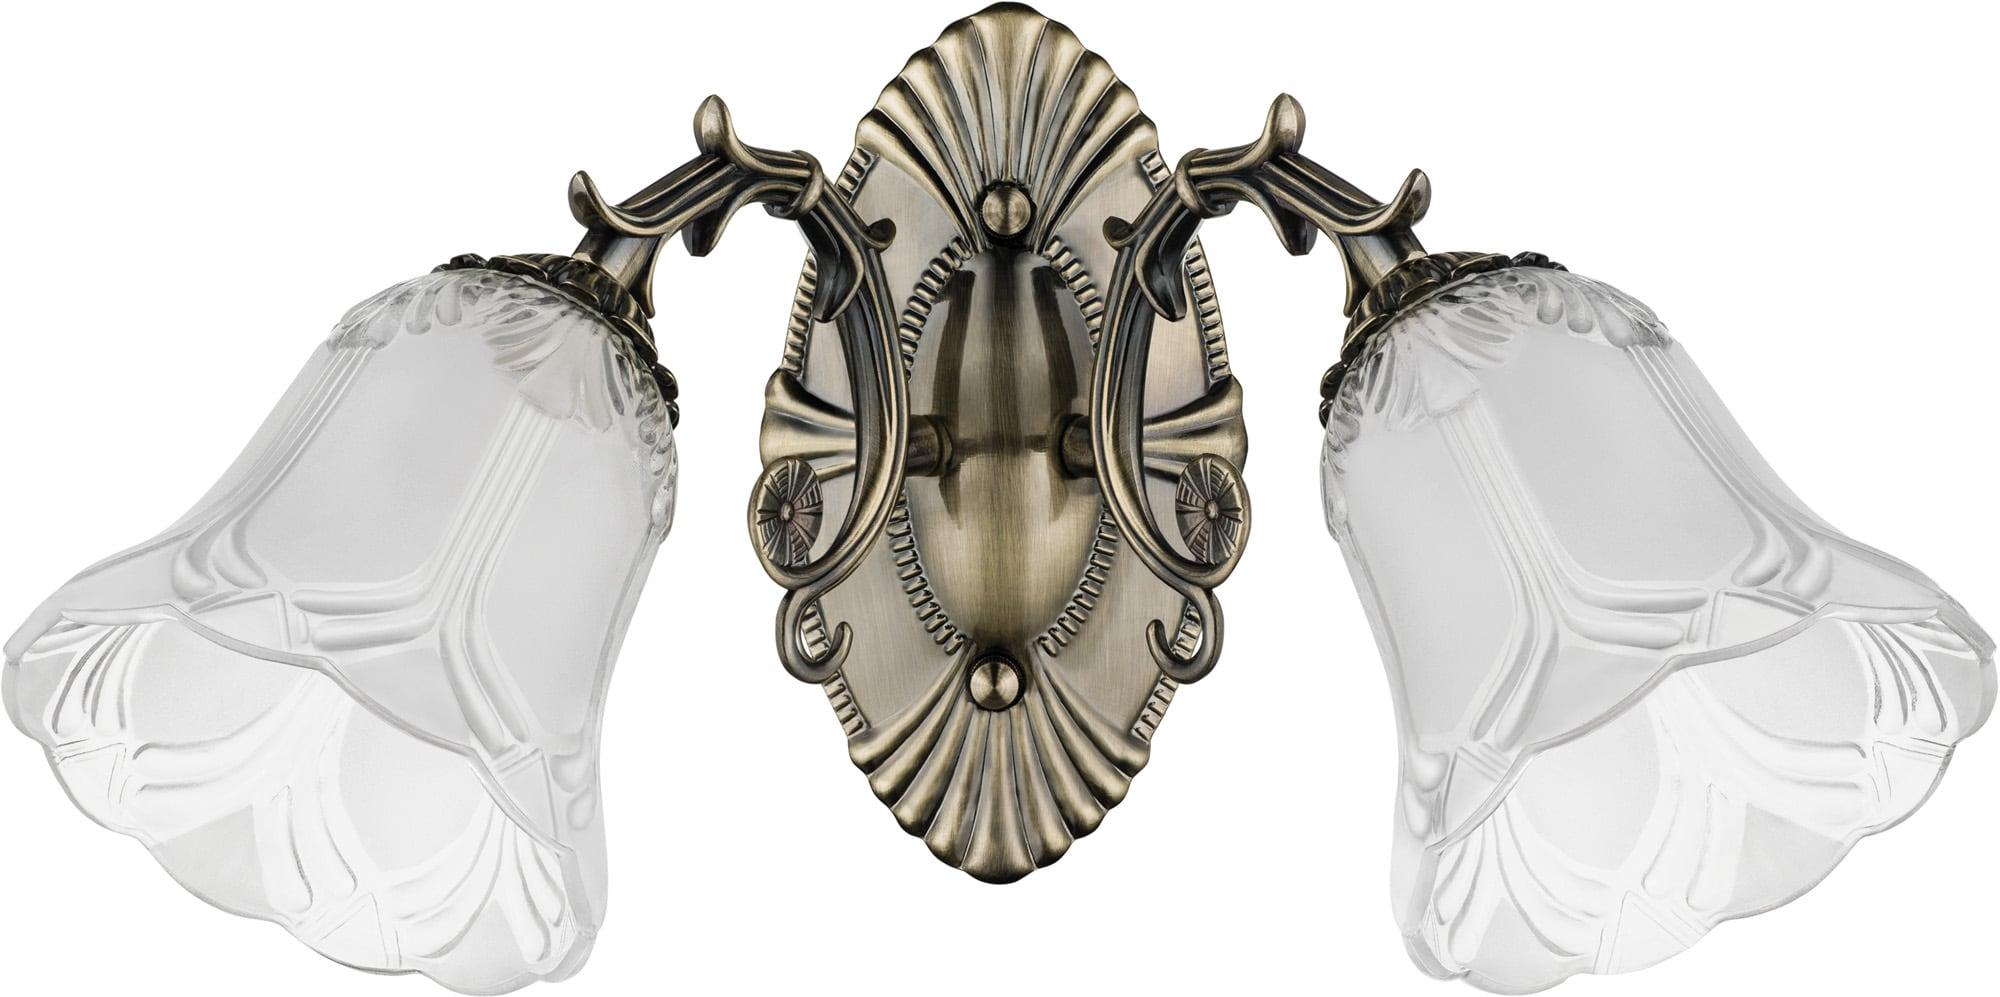 Dvojitá nástěnná lampa Clotilde patina / bílá E27 60W